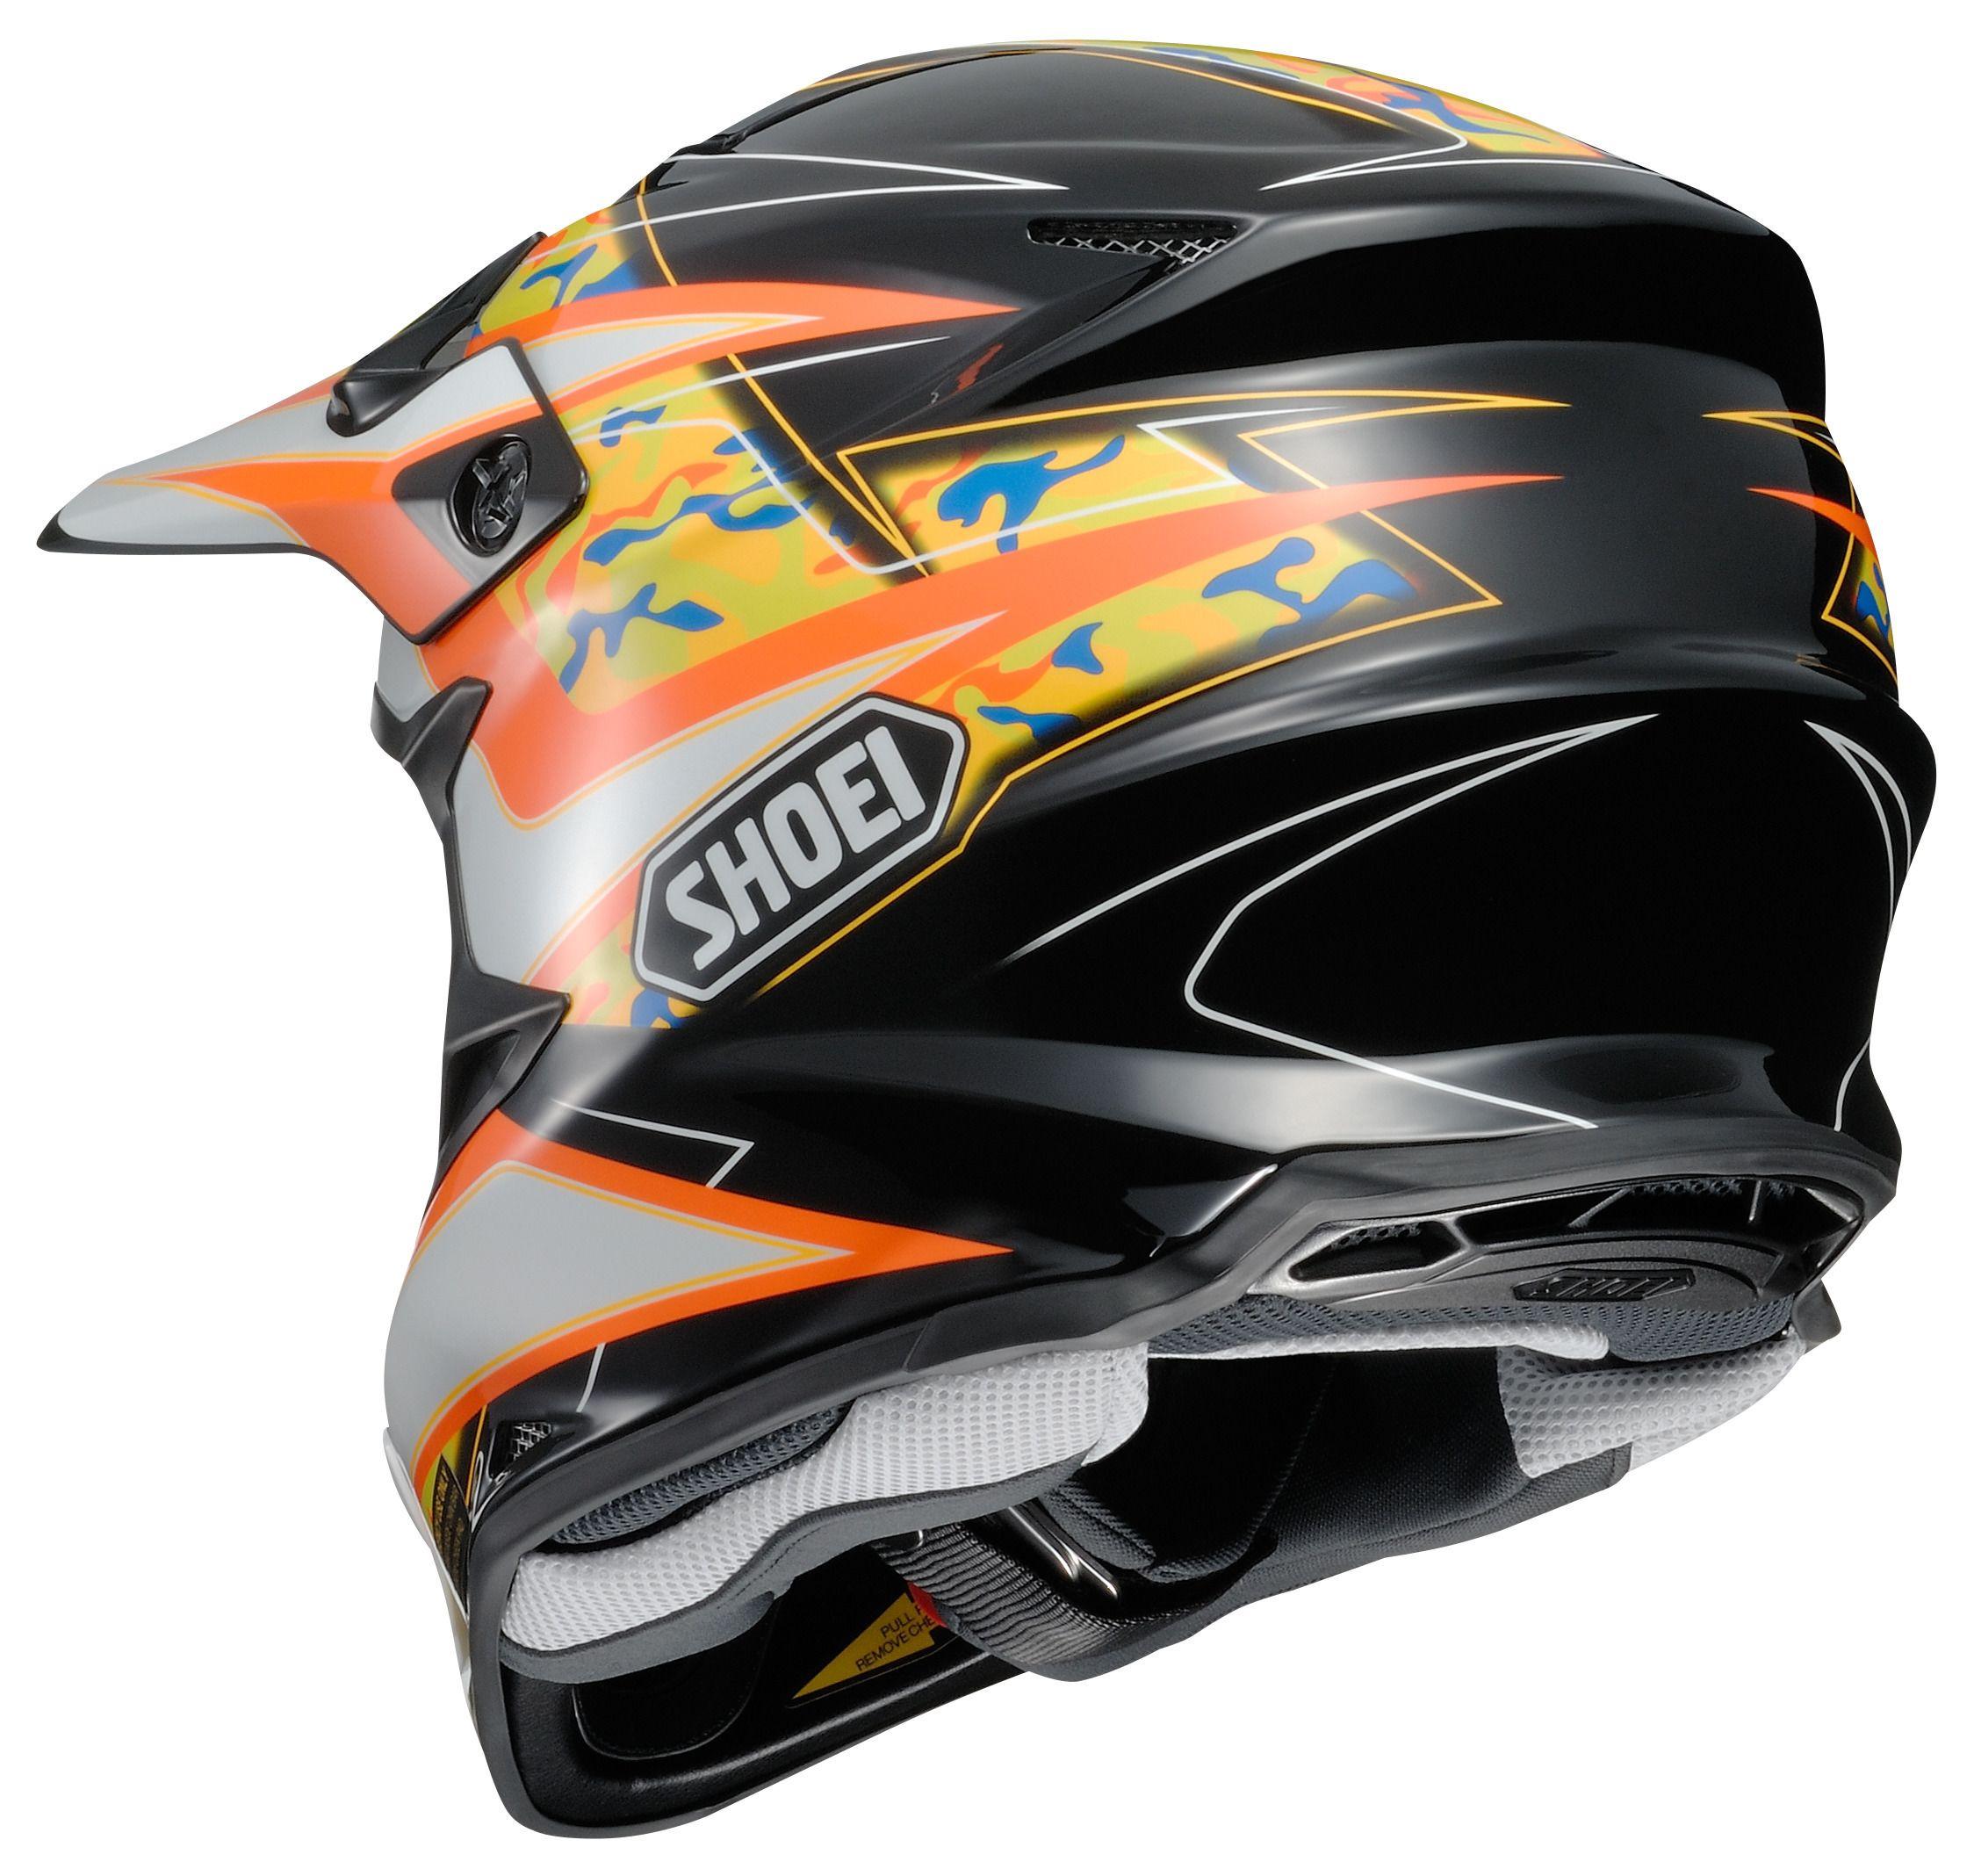 51615a0f525 Off Road Helmets With Visor » Kortnee Kate Photography